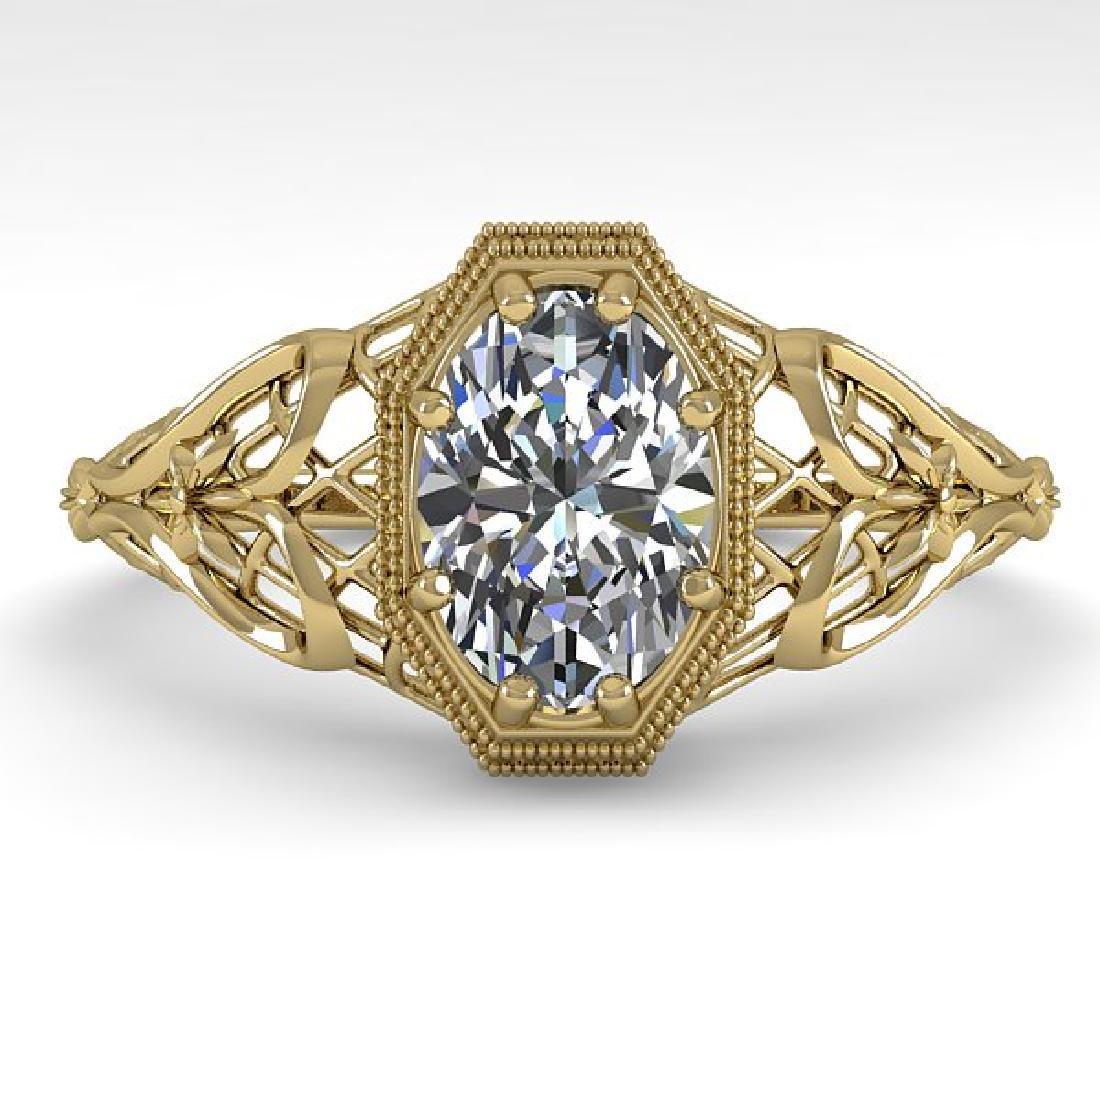 1.0 CTW VS/SI Oval Diamond Solitaire Ring Art Deco 14K